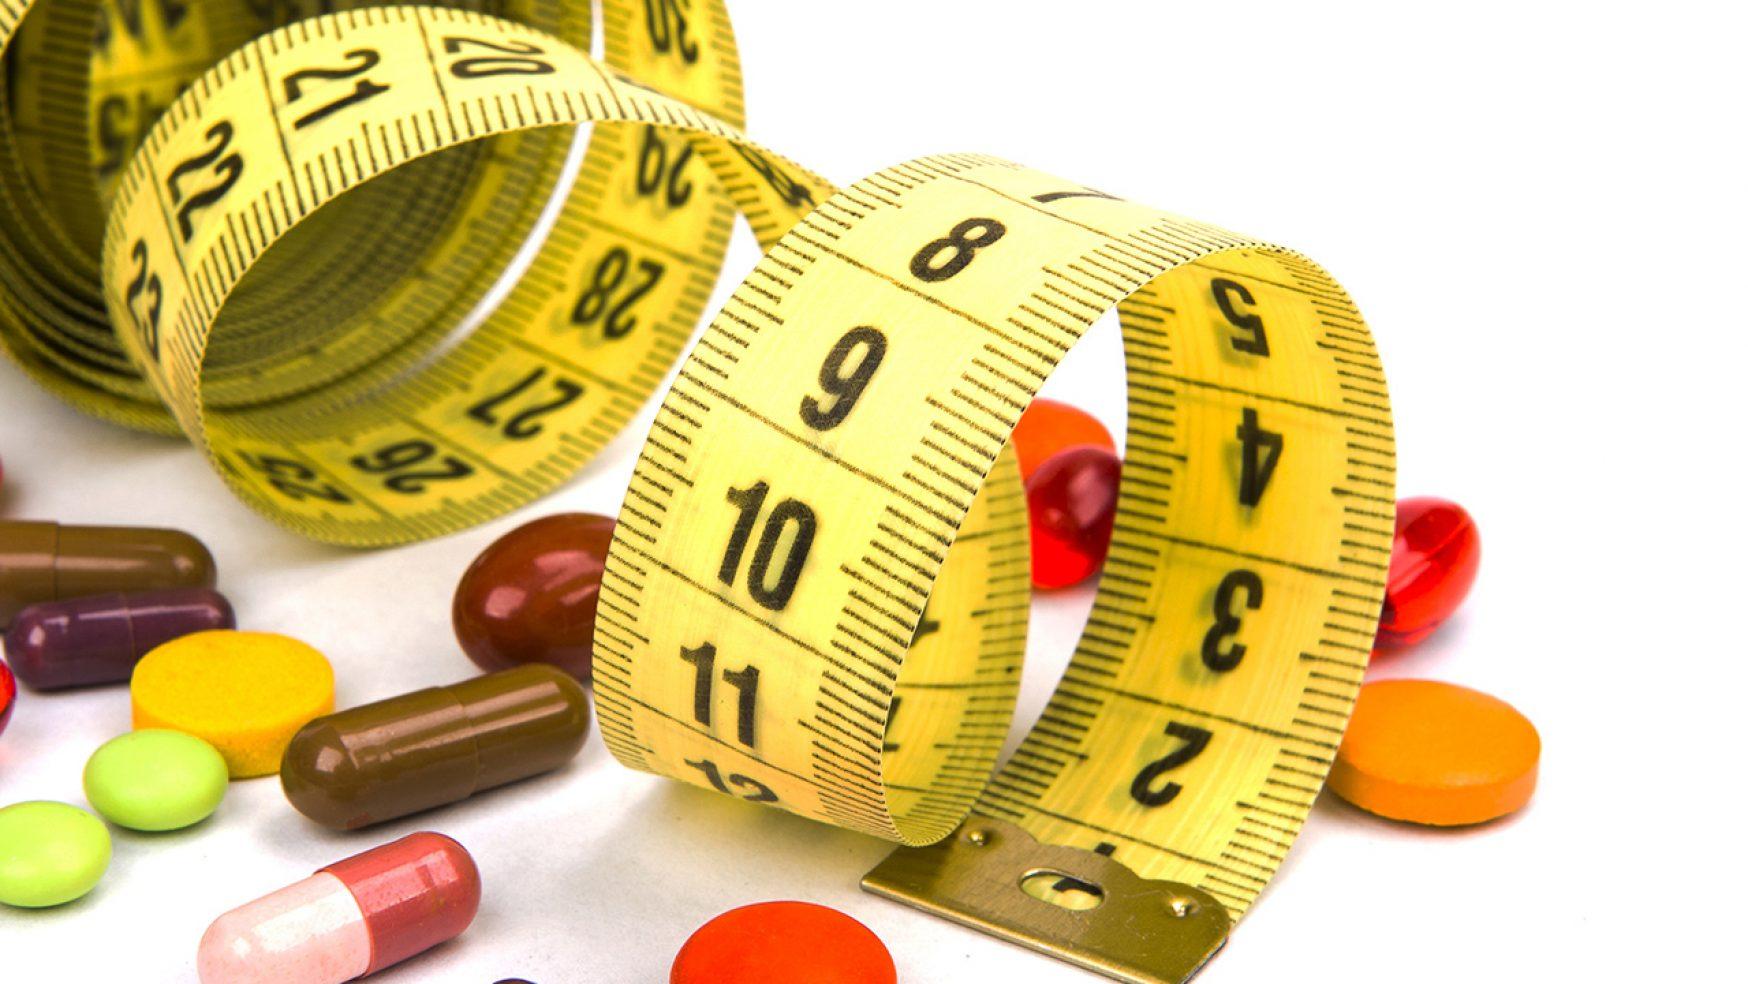 New alternatives for Diabetes treatment